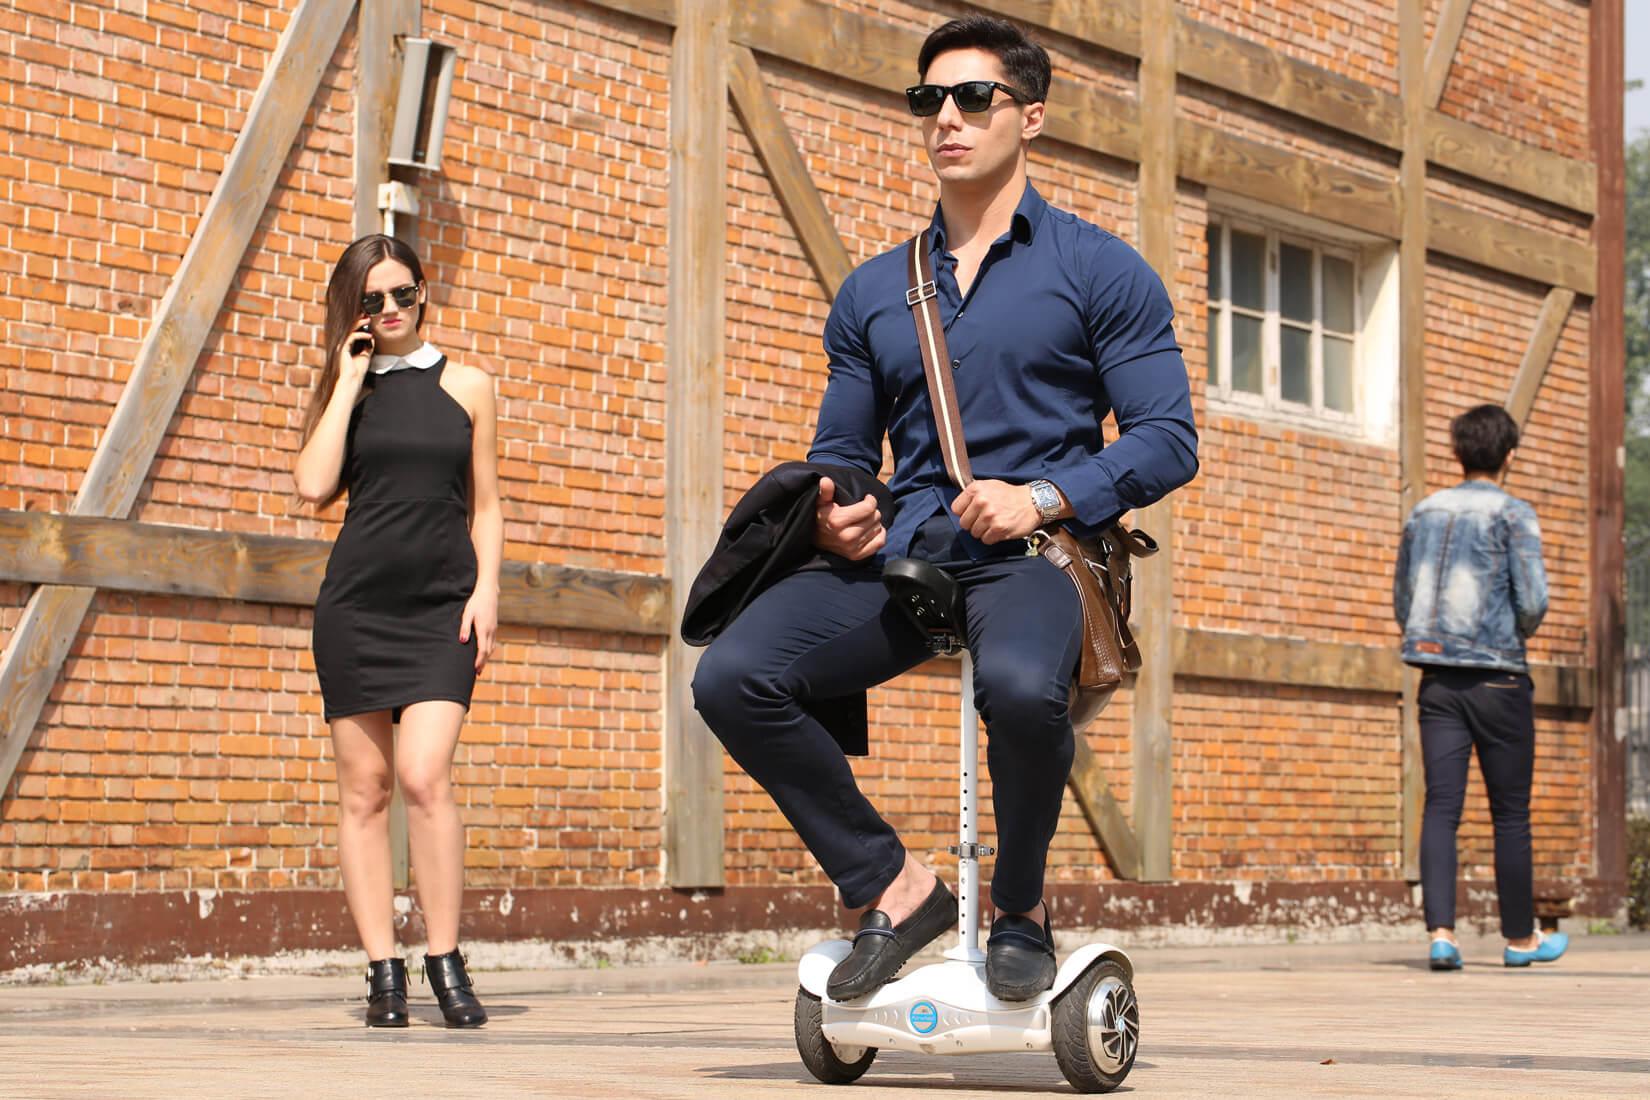 S6 walkcar